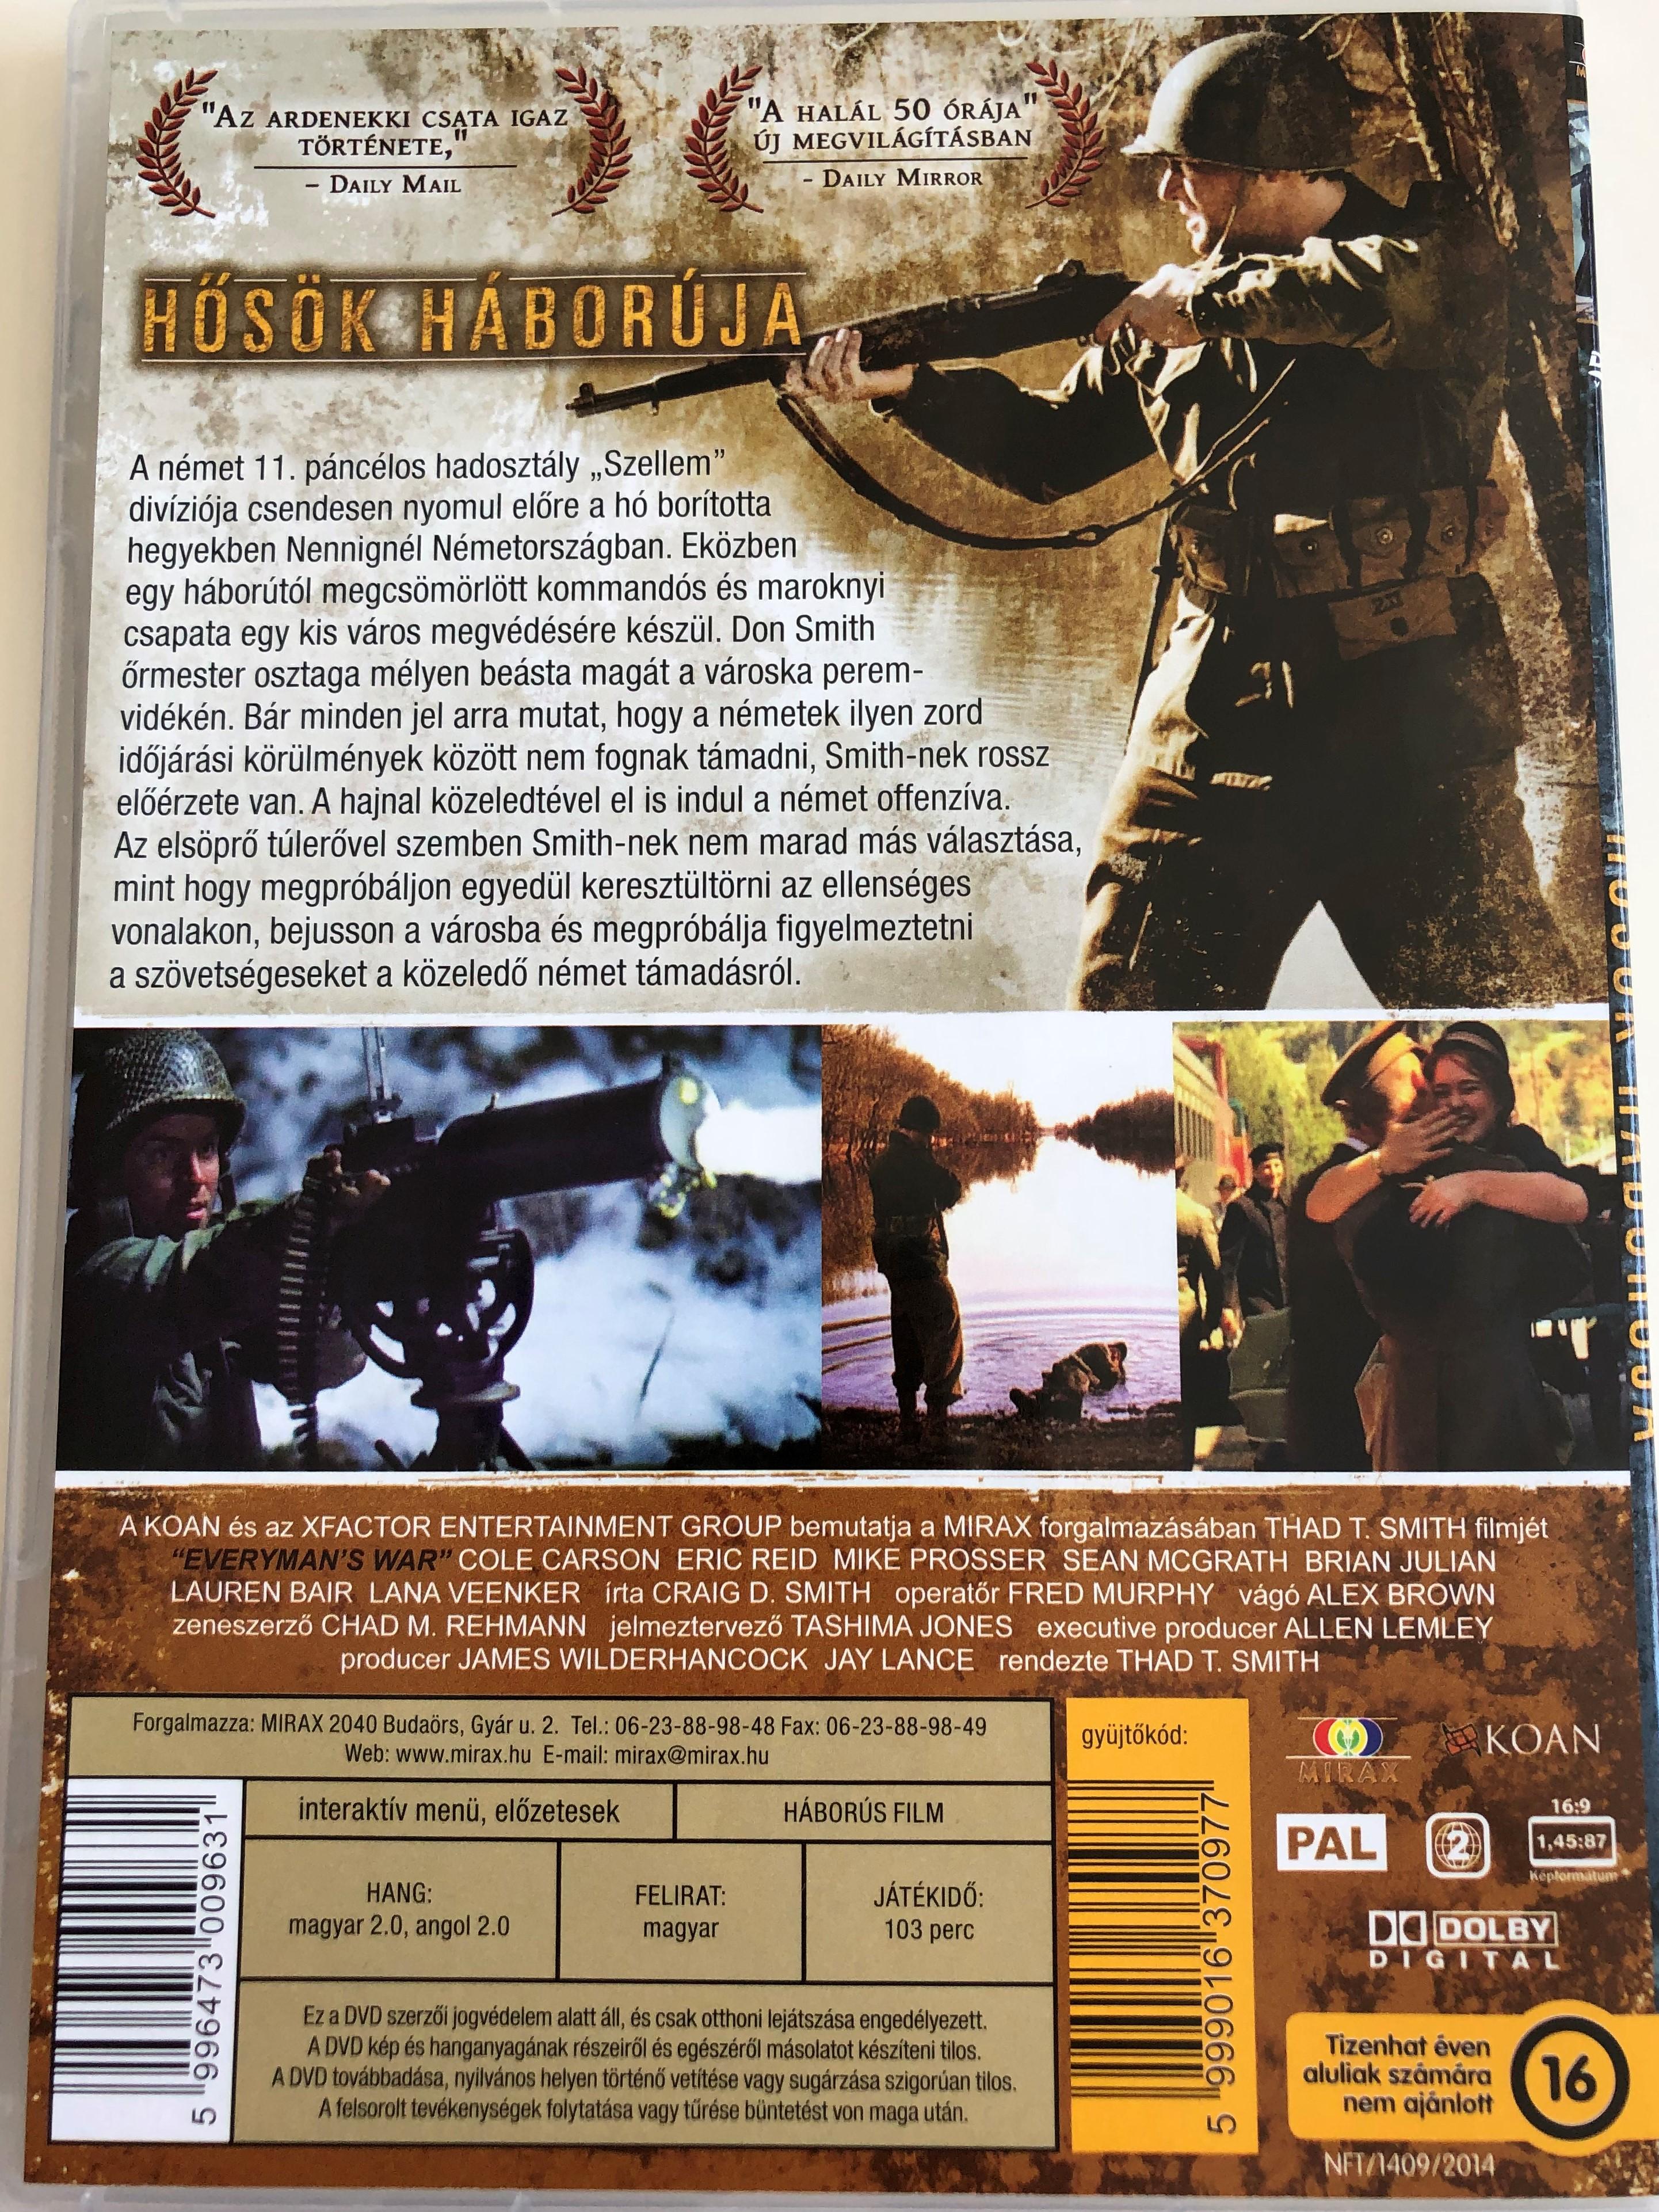 everyman-s-war-dvd-2010-h-s-k-h-bor-ja-directed-by-thad-t.-smith-starring-cole-carson-eric-reid-mike-prosser-sean-mcgrath-2-.jpg